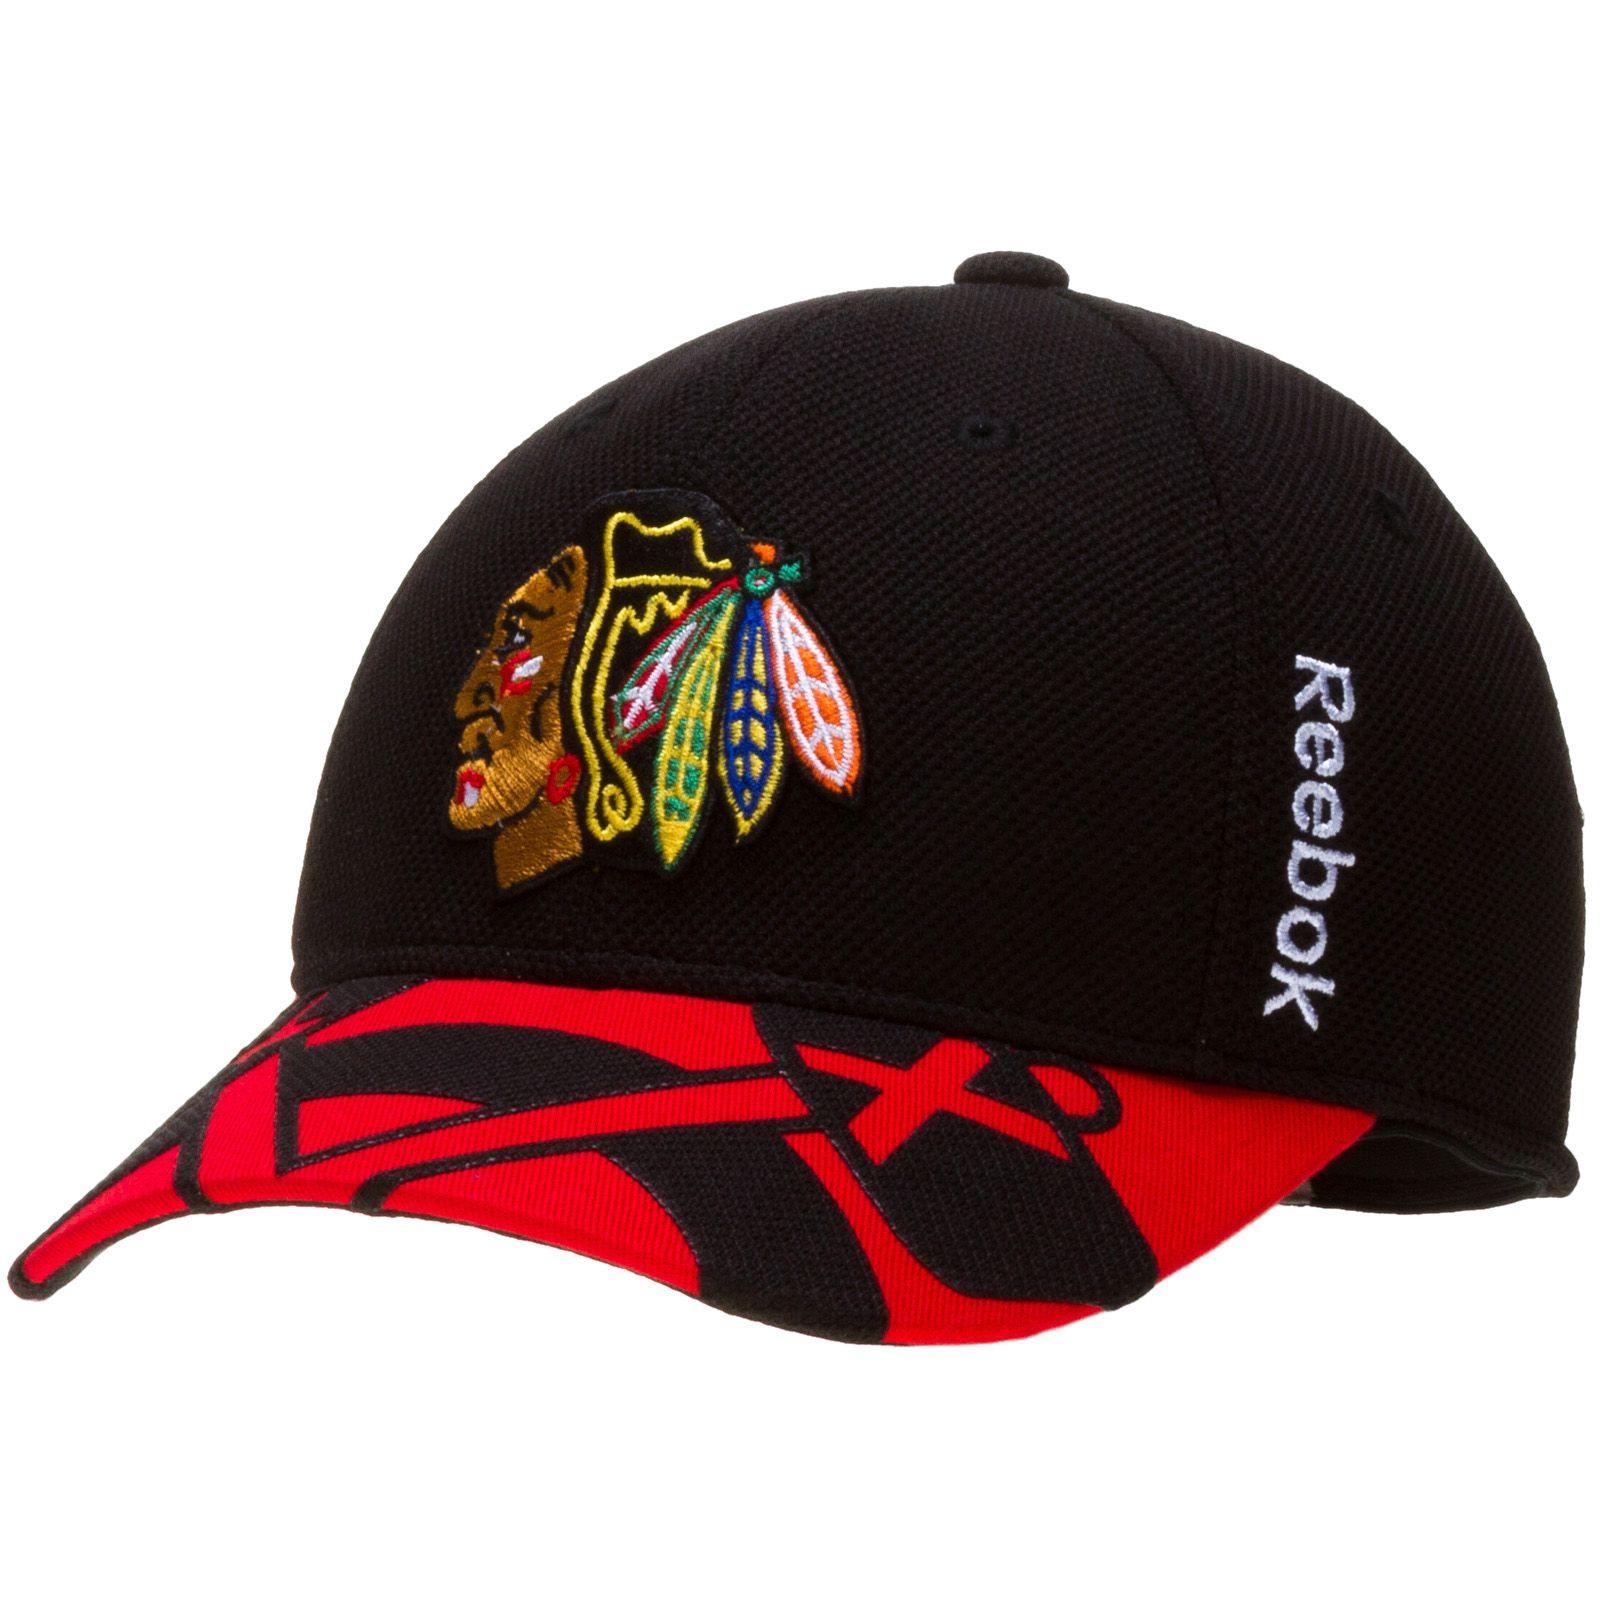 Chicago blackhawks youth 2015 draft flex fit hat by reebok